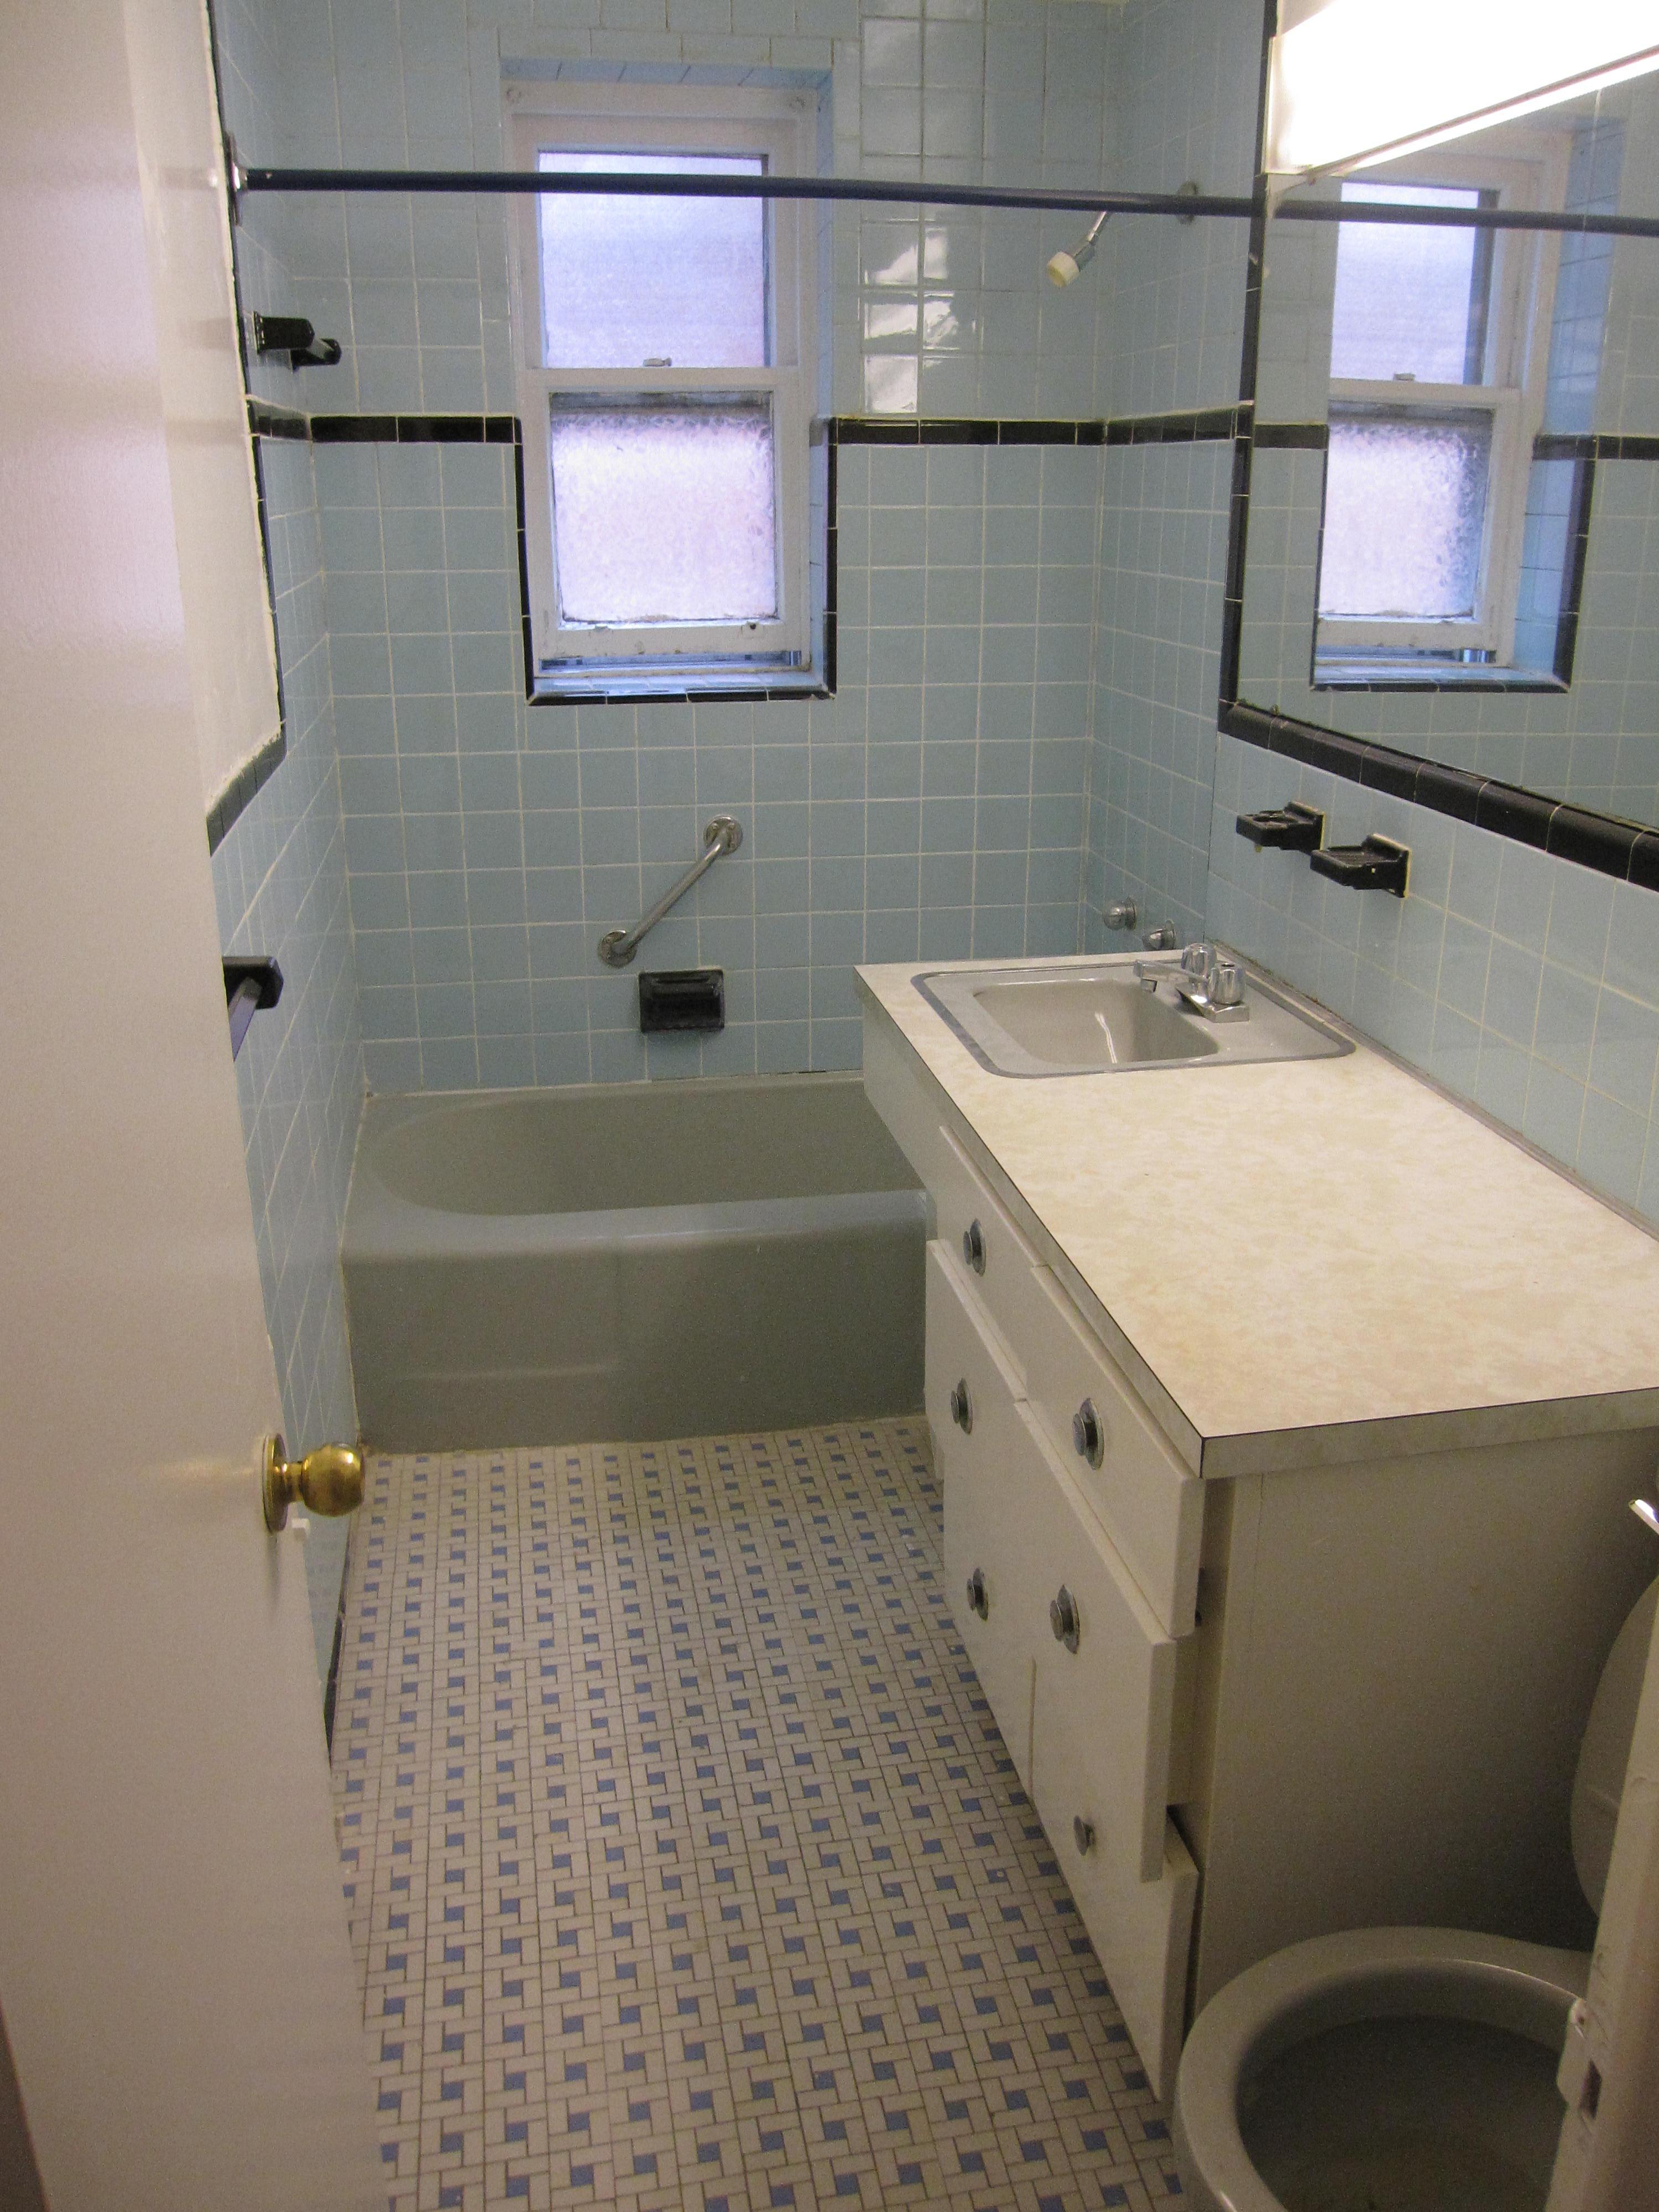 2 bedroom Apartments for rent in Notre-Dame-de-Grace at 4635 Clanranald - Photo 01 - RentersPages – L23639